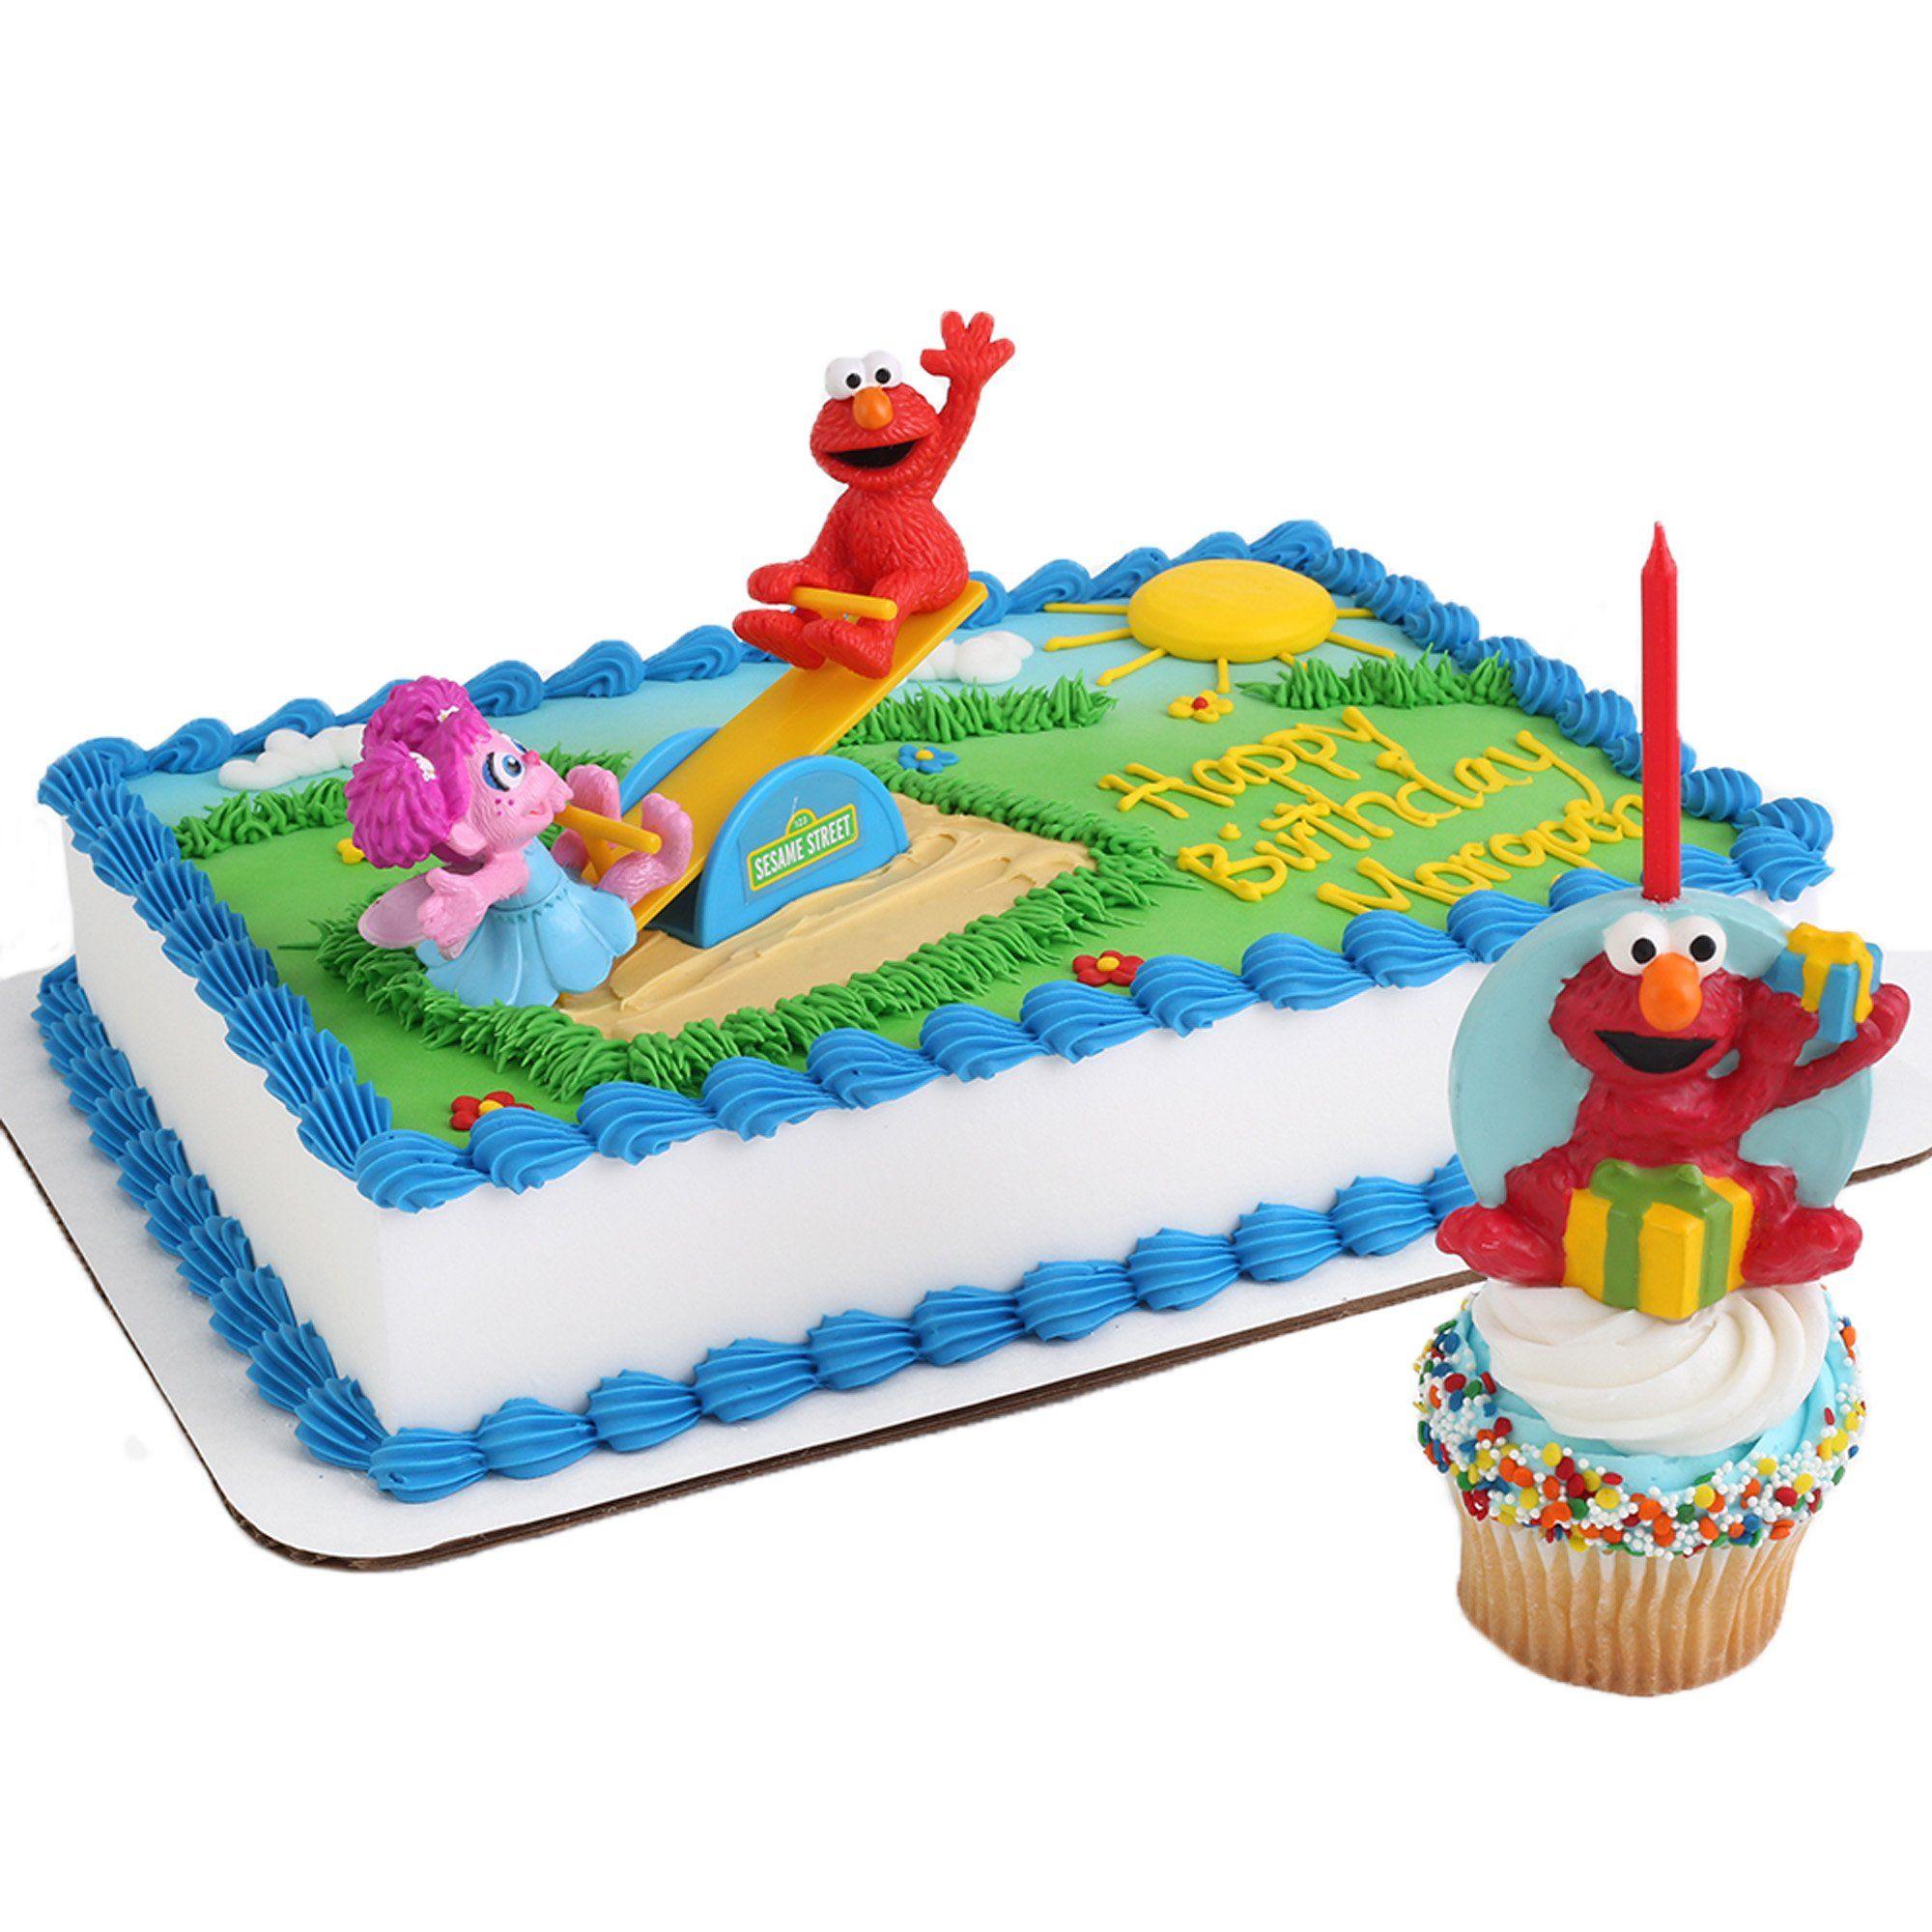 Sesame Street Cake Topper and Elmo Candle Alice Elmo and Minnie